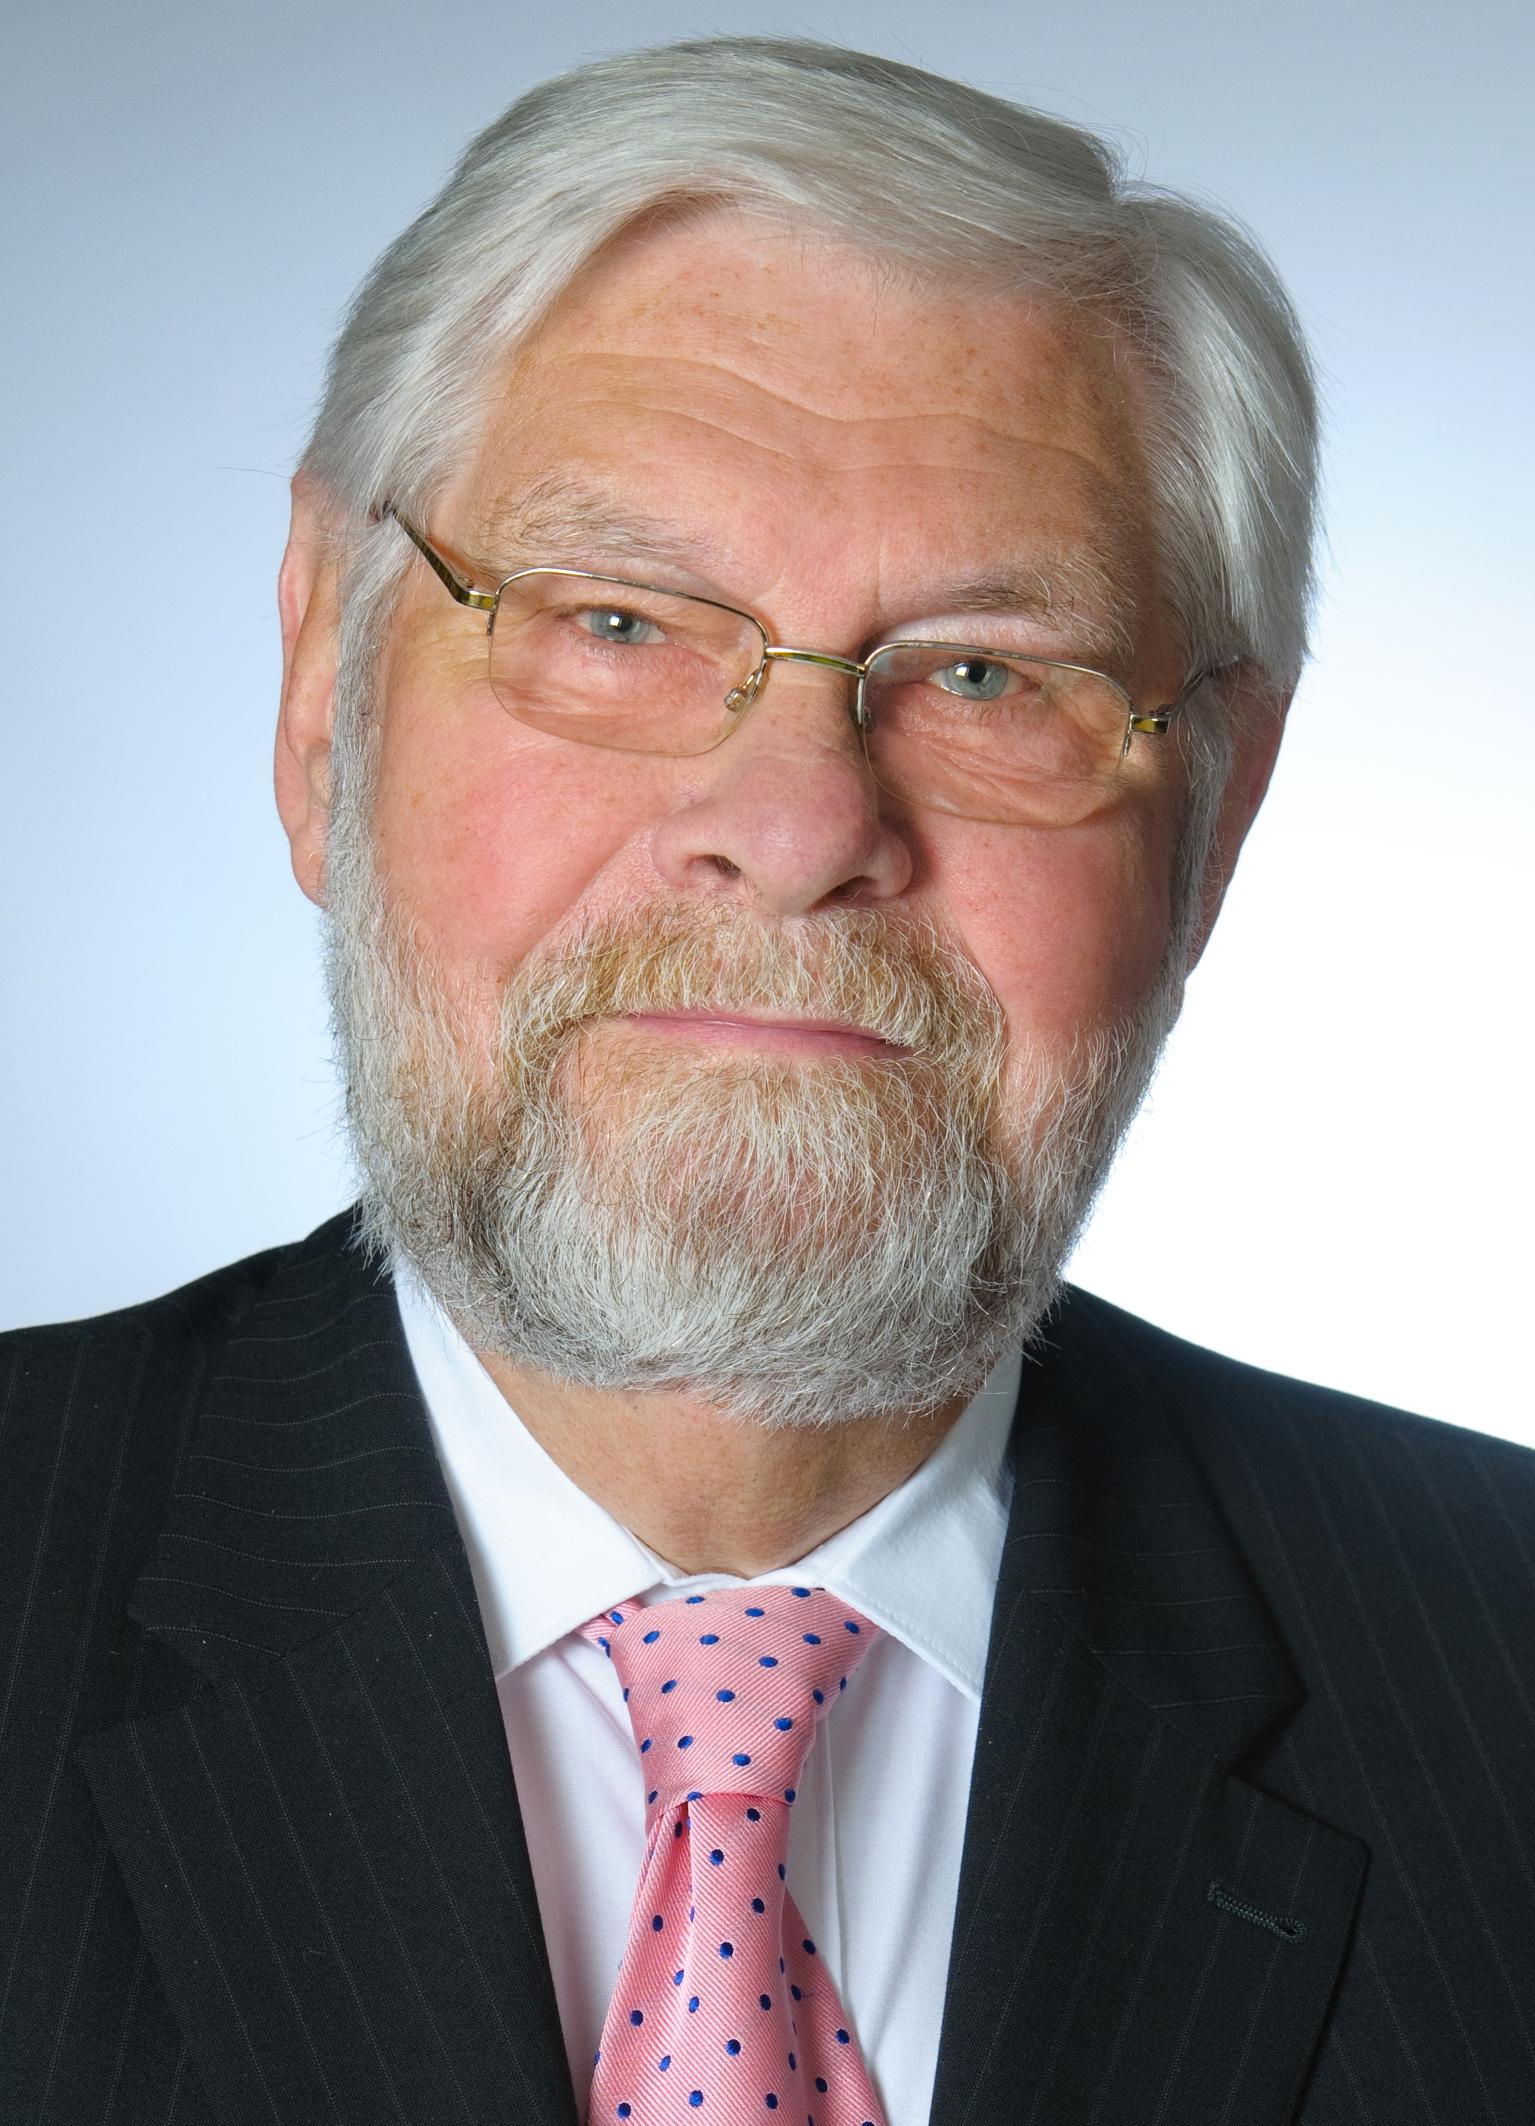 Joachim Zacher